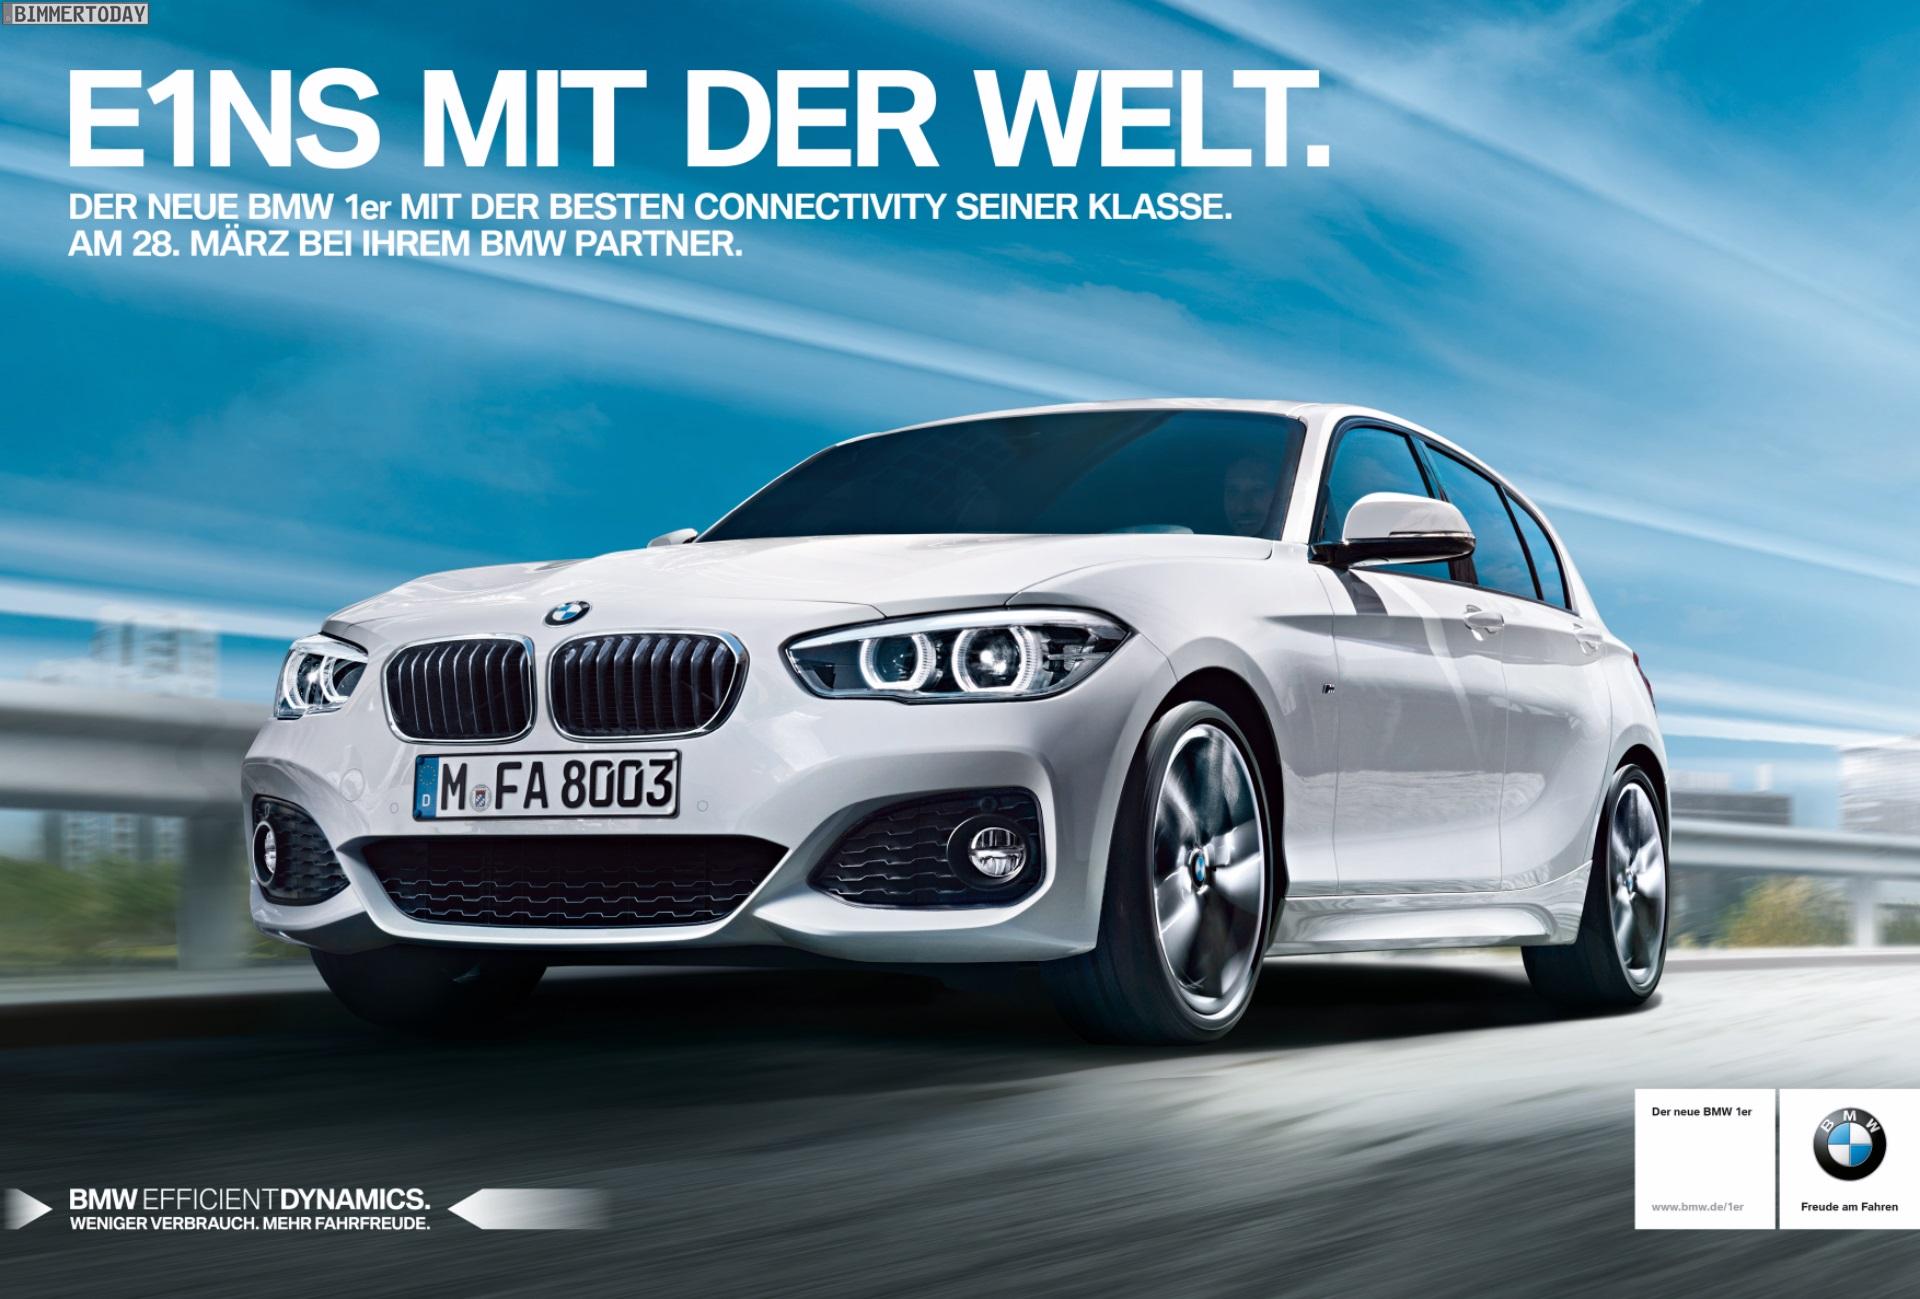 Bmw 1er Facelift 2015 Werbe Kampagne E1ns Mit Der Welt